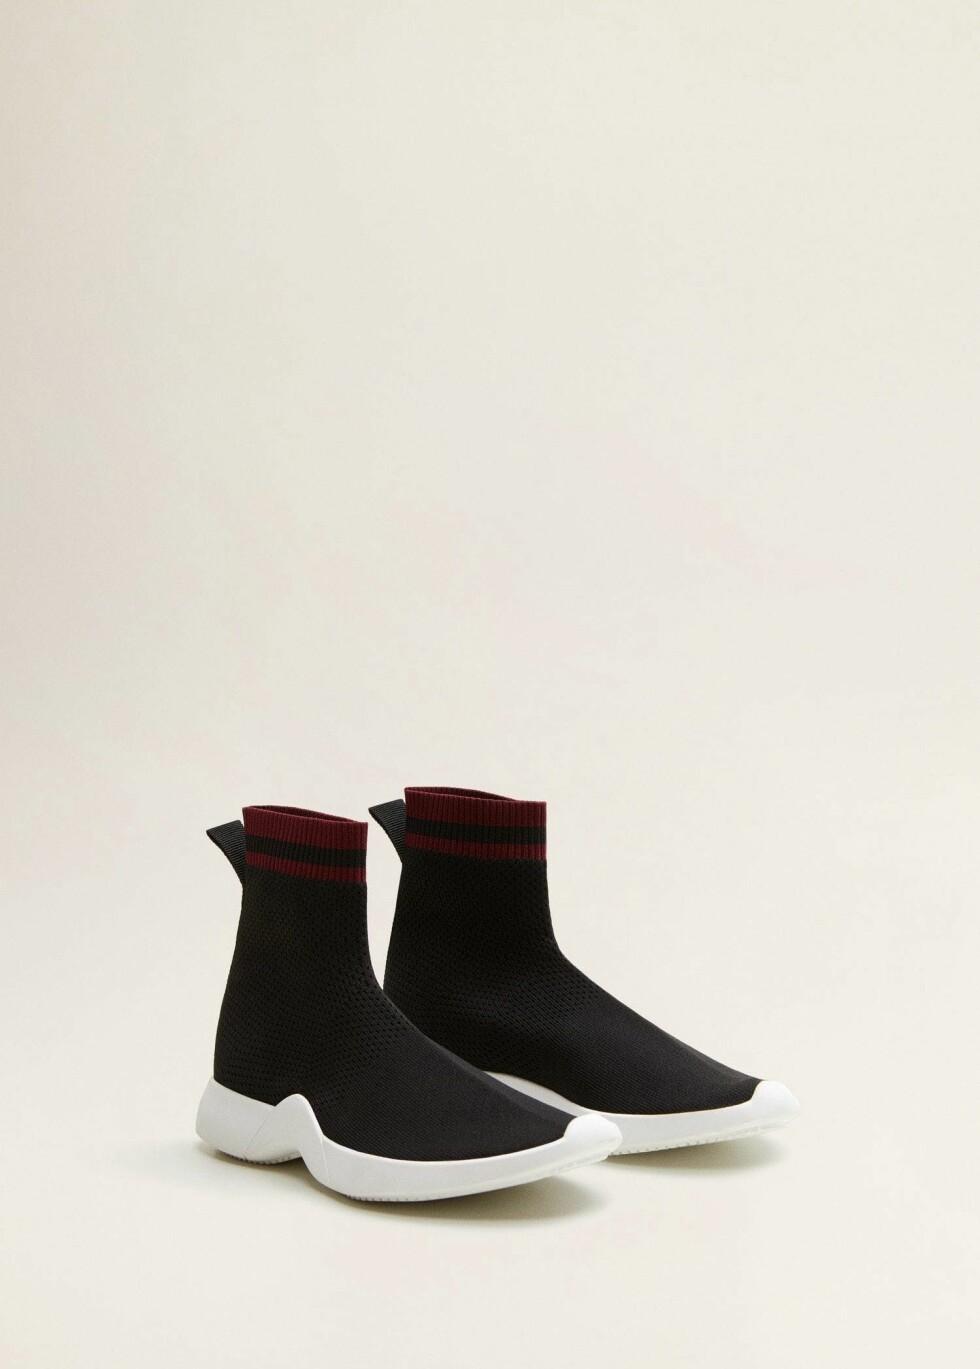 Sko fra Mango |299,-| https://shop.mango.com/no-en/women/shoes-sneakers/sole-sock-sneakers_33075761.html?c=99&n=1&s=Rebajas_she.accesorio;42,342,442